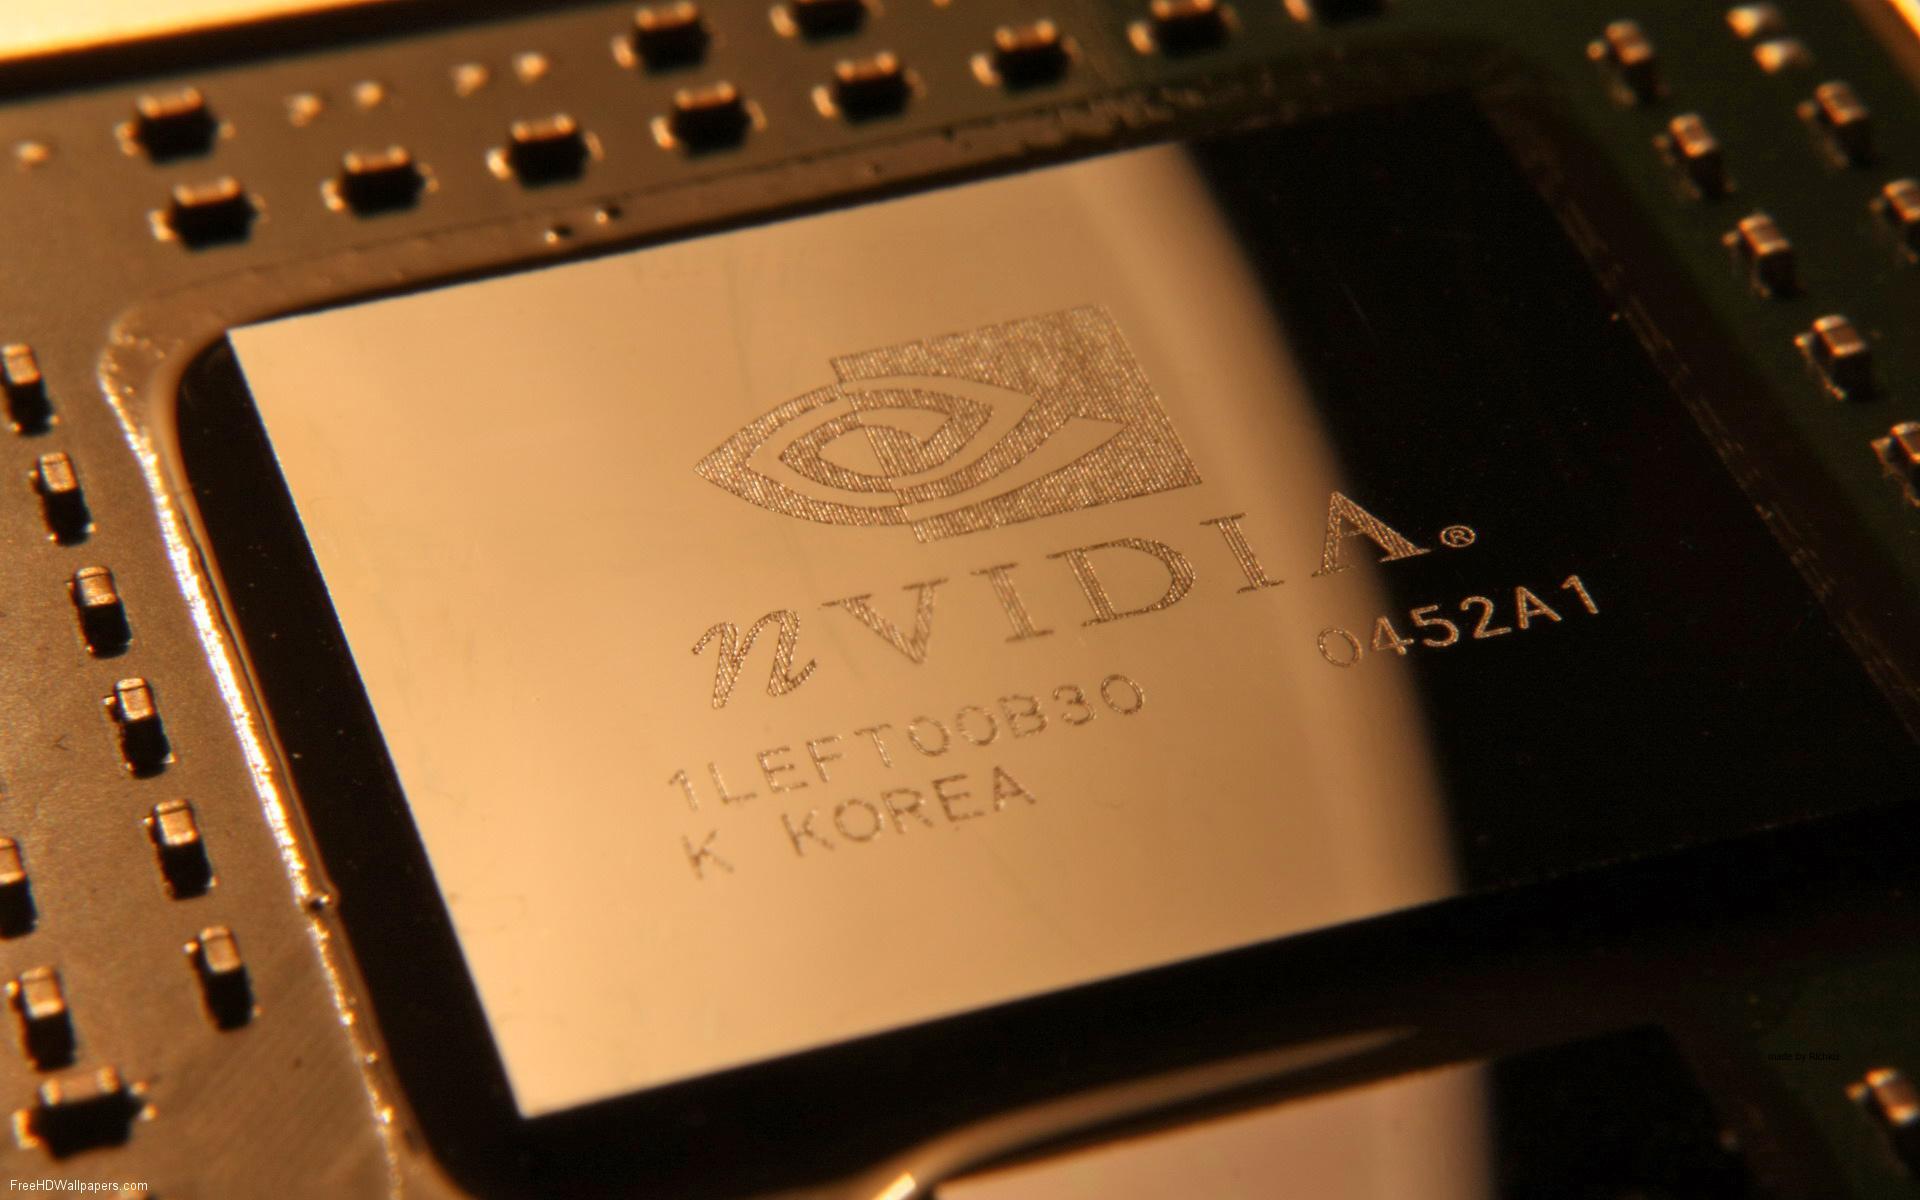 General 1920x1200 Nvidia graphics card GPU